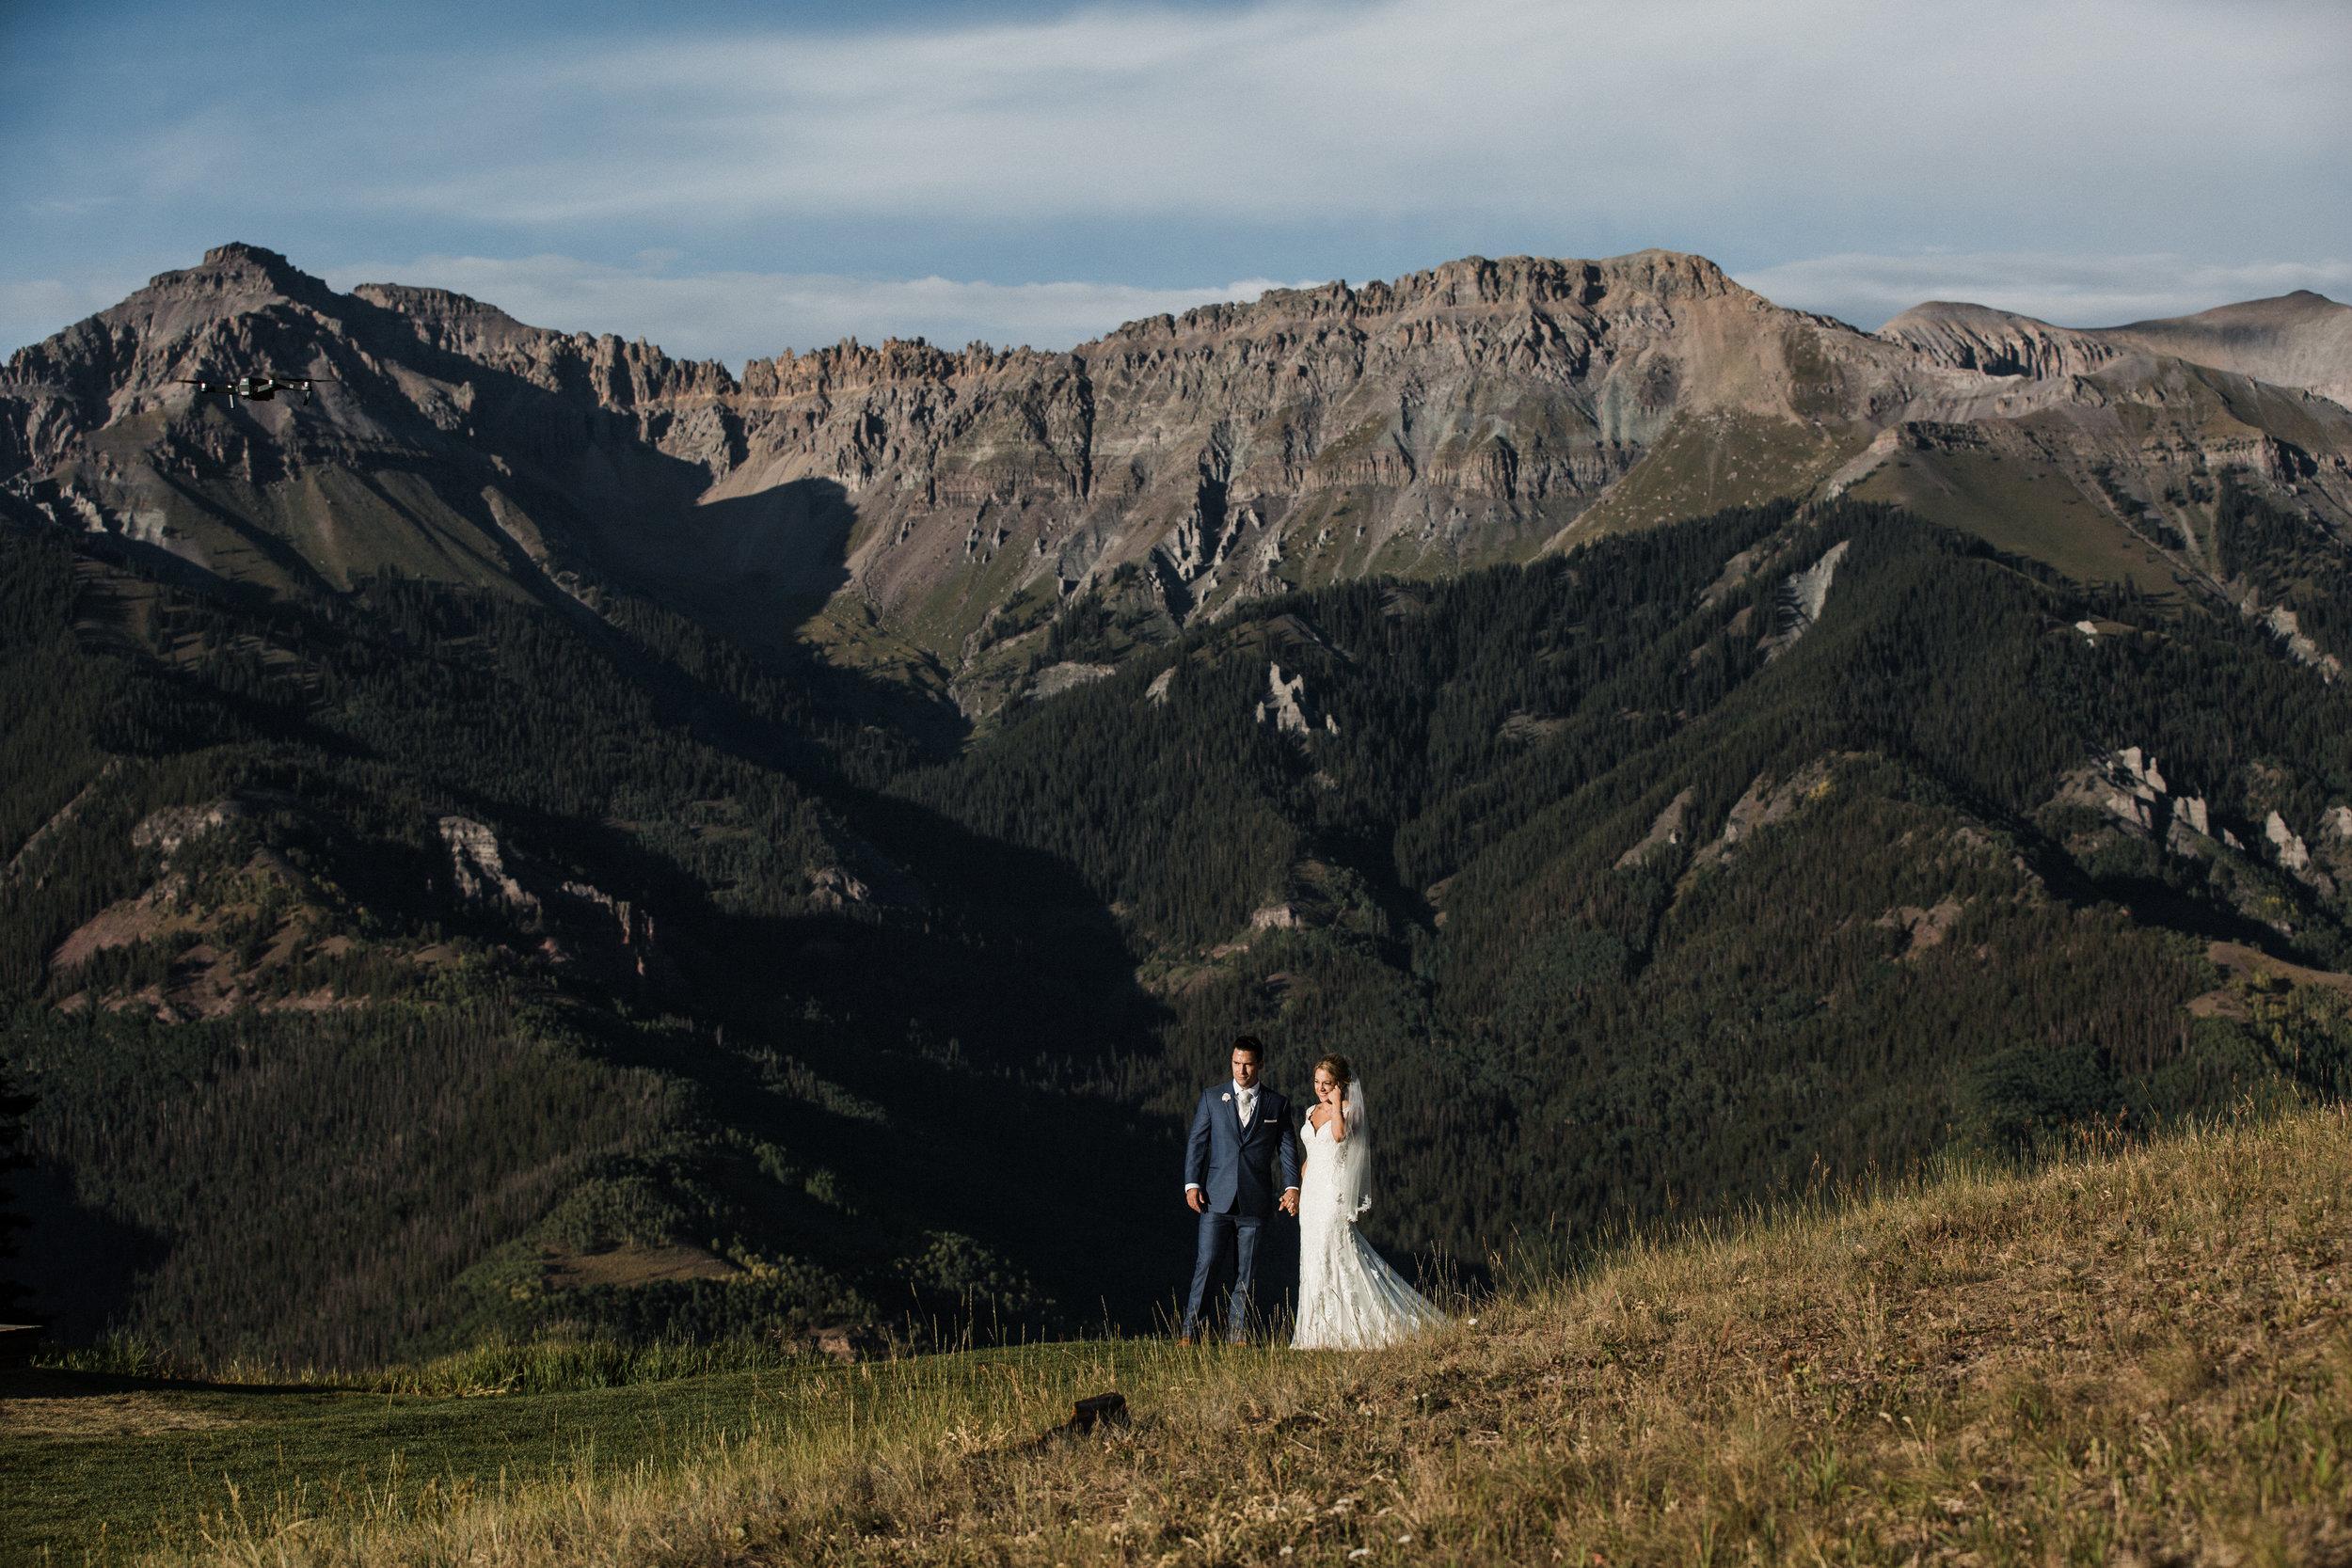 leahandashton-telluride-wedding-photography-0075.jpg